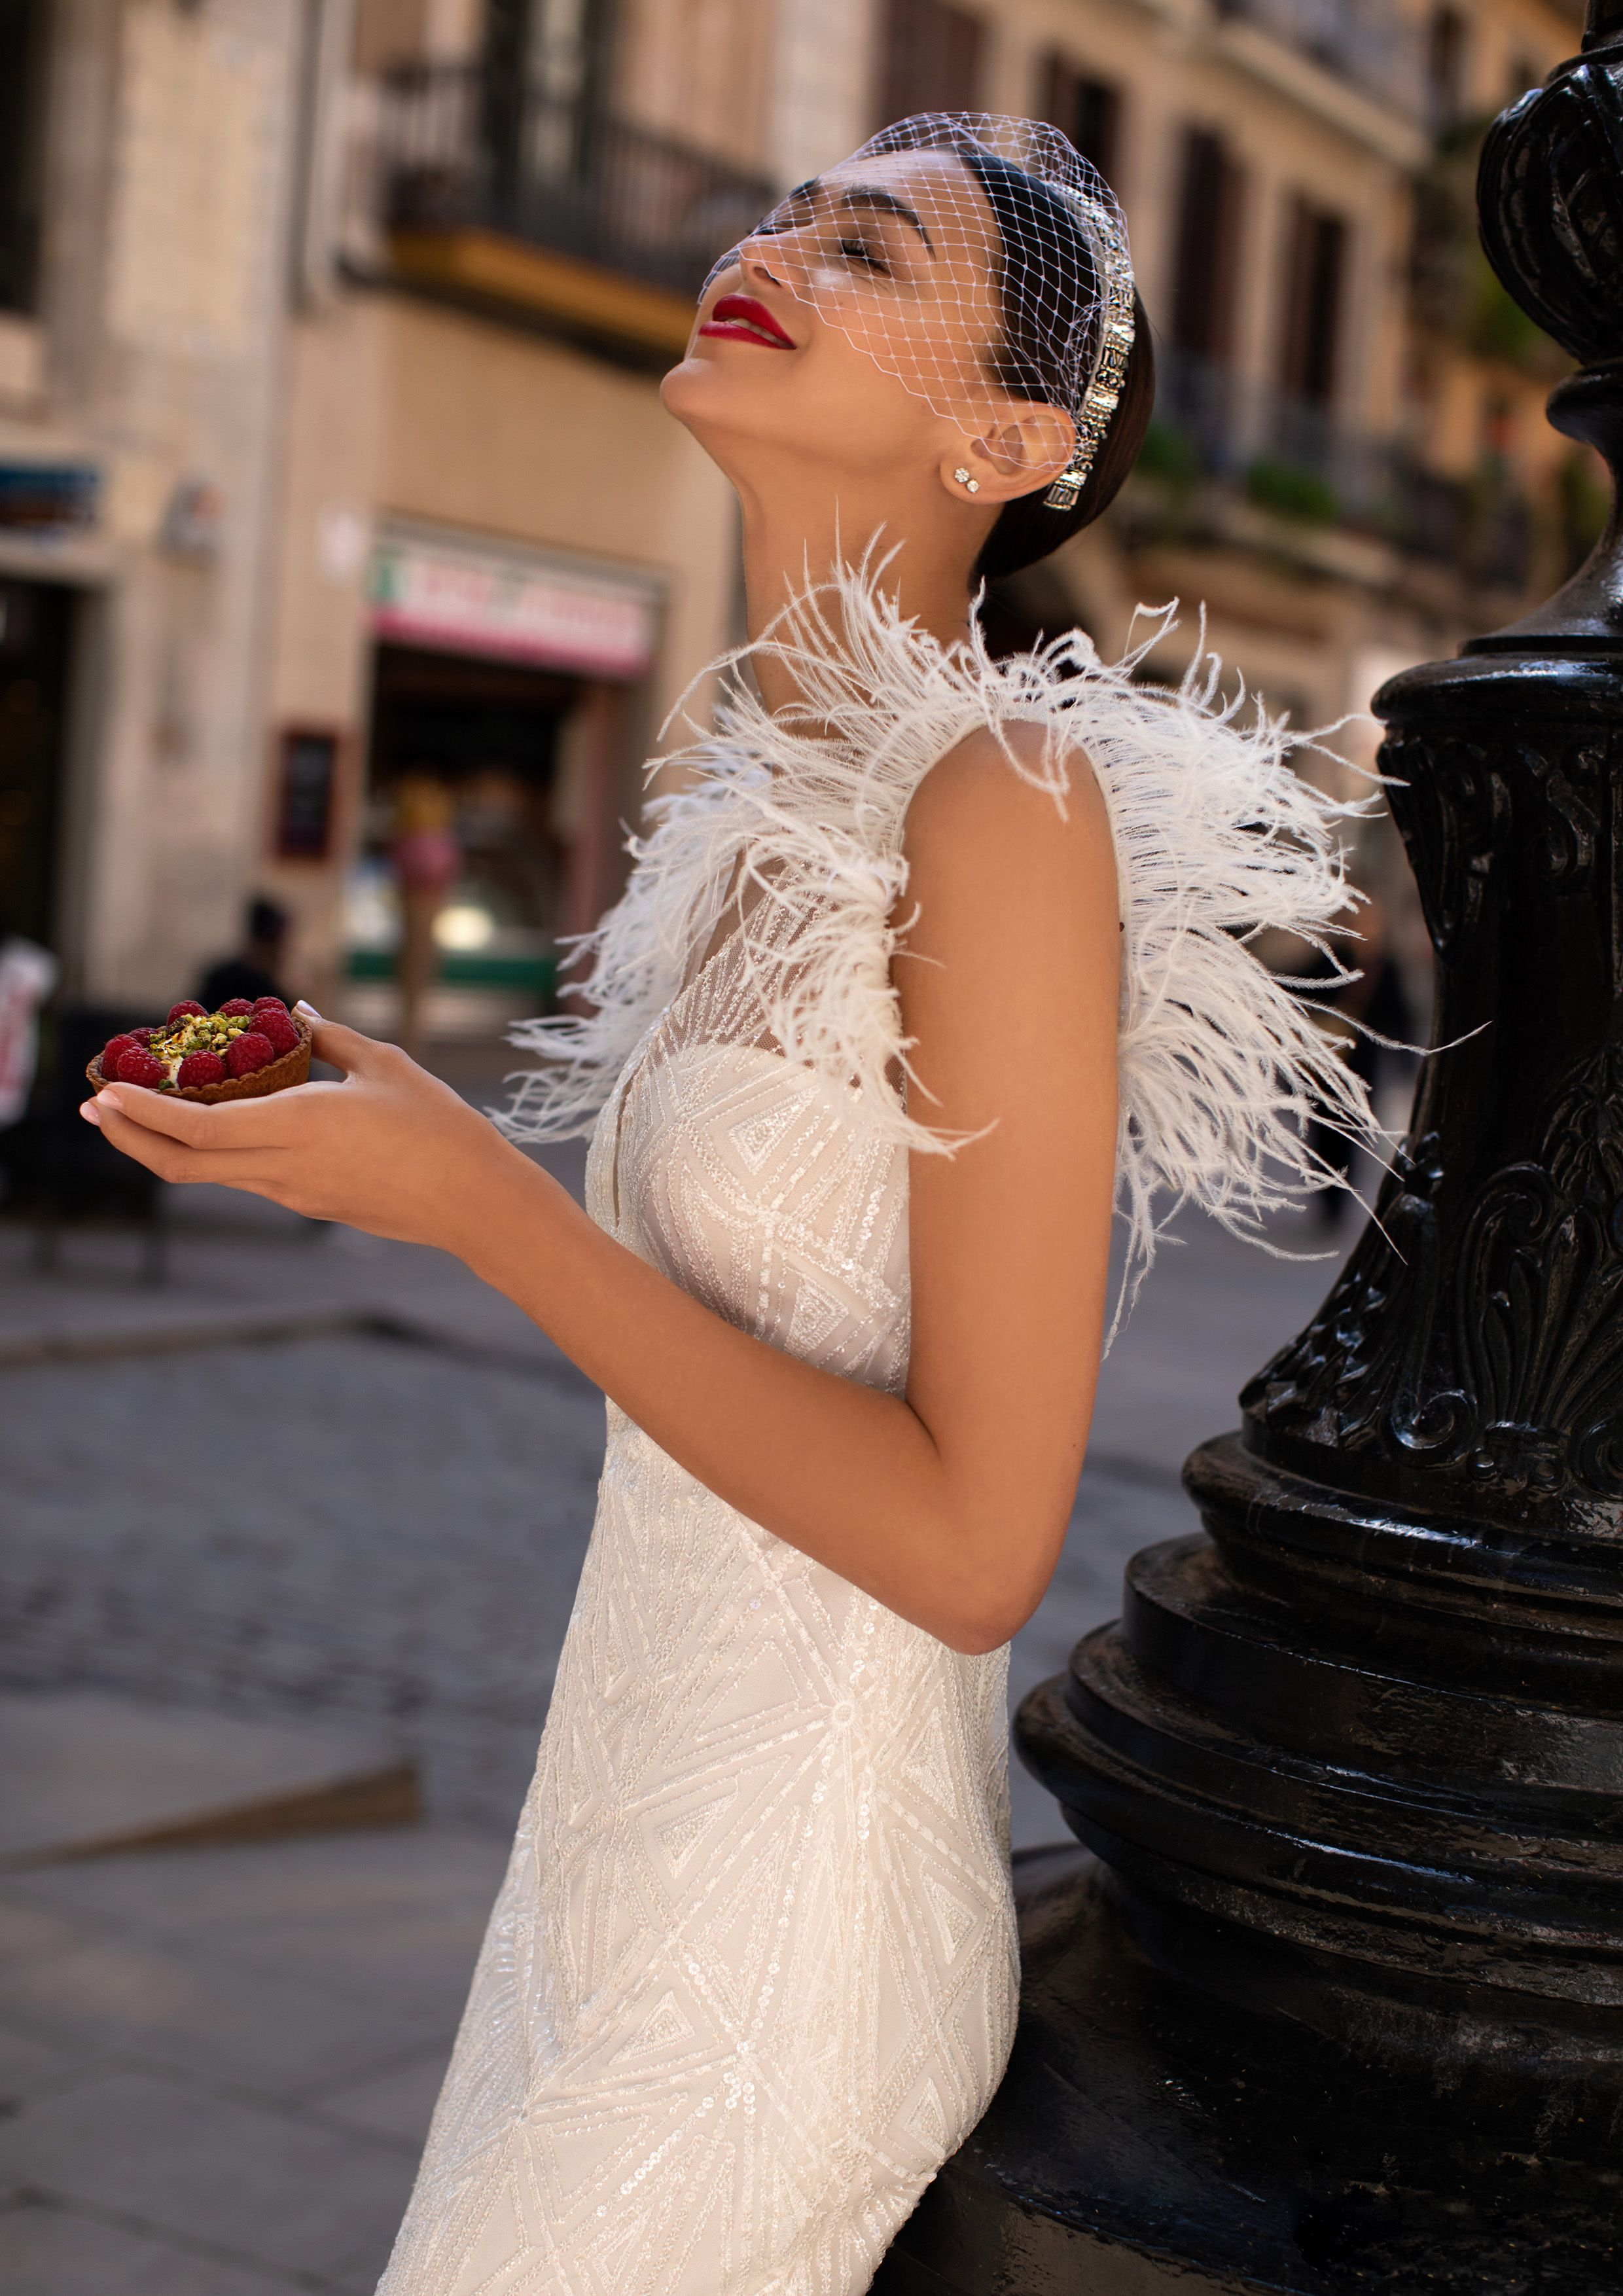 Lwd 05 Short Wedding Dress Platya Naryady Svadba [ 3508 x 2480 Pixel ]